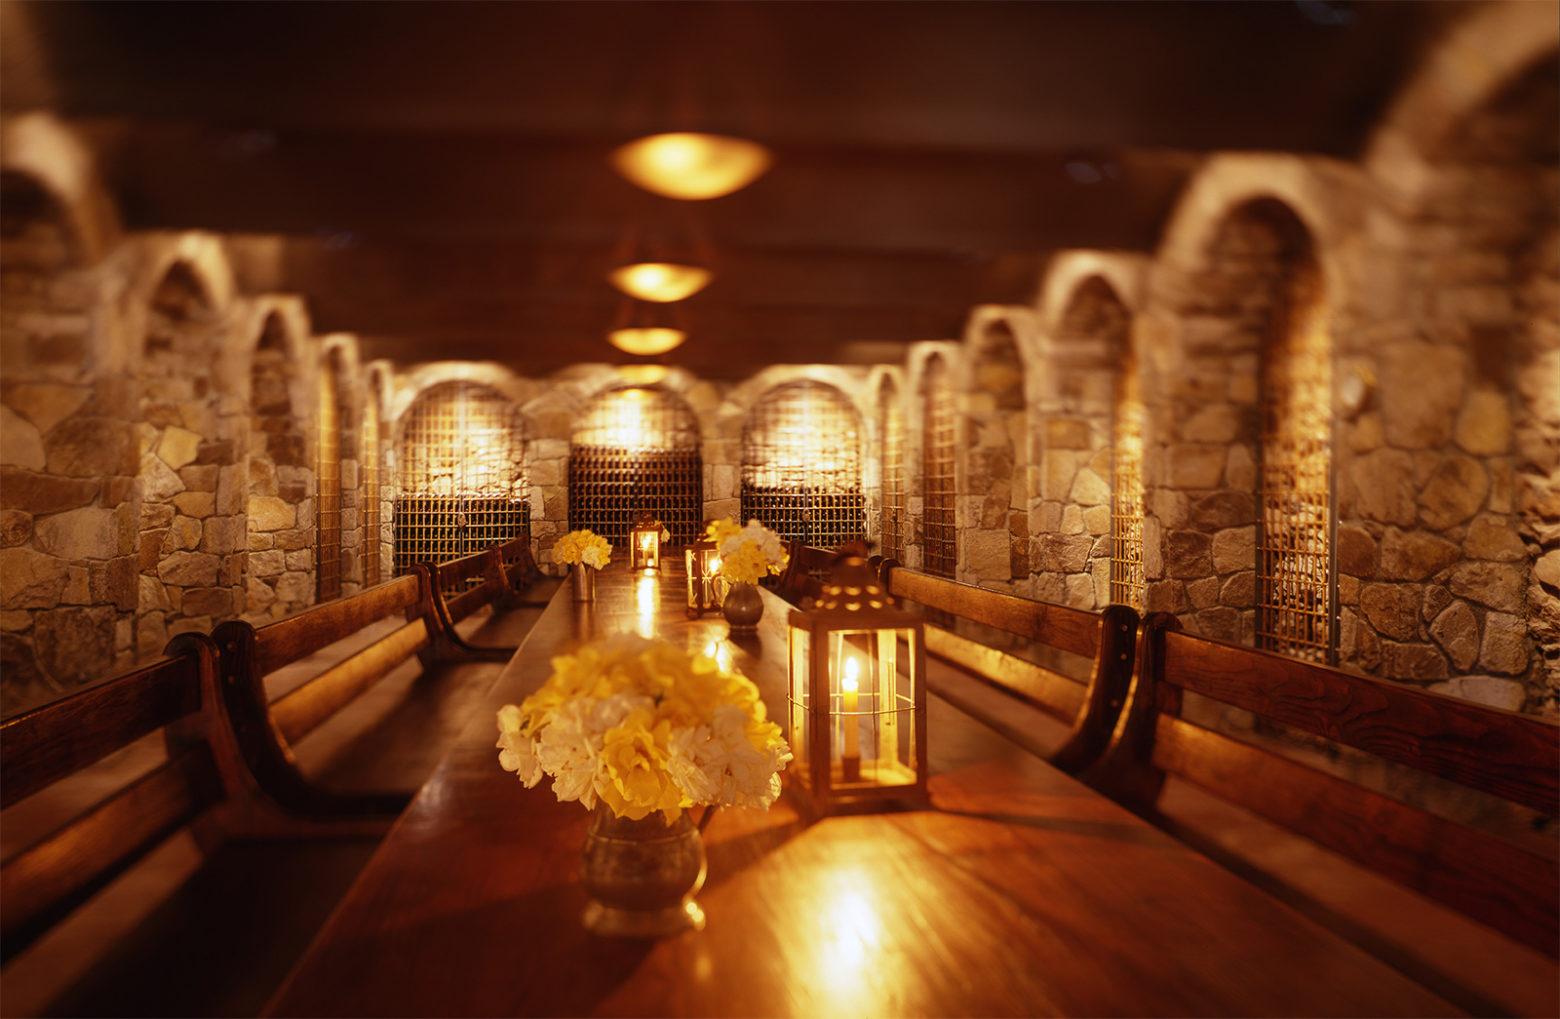 Palmaz Vineyards tasting room